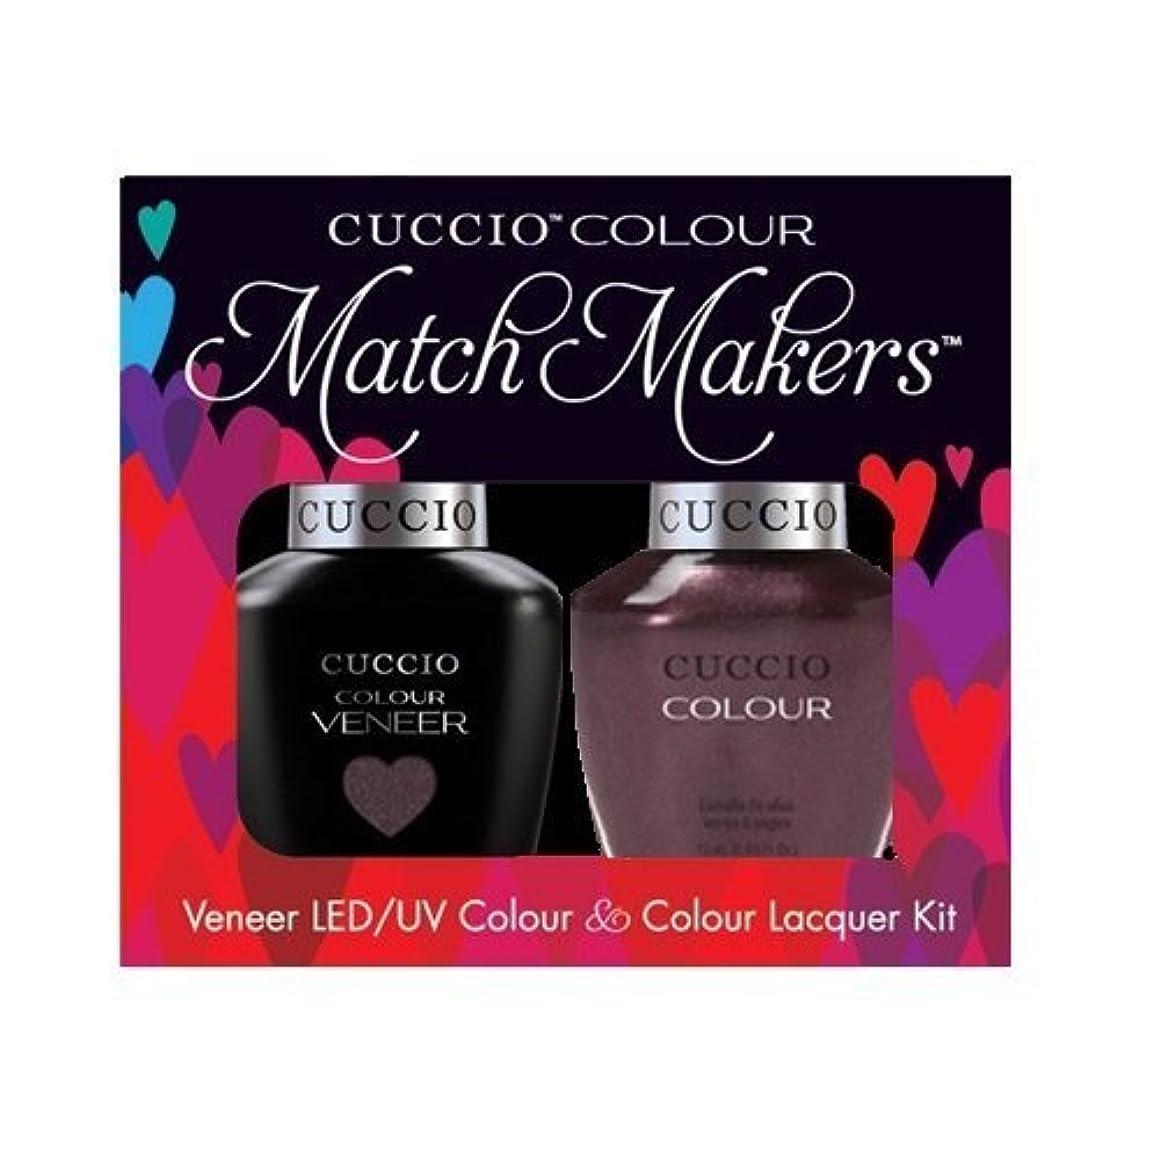 Cuccio MatchMakers Veneer & Lacquer - One Night in Bangkok - 0.43oz / 13ml Each